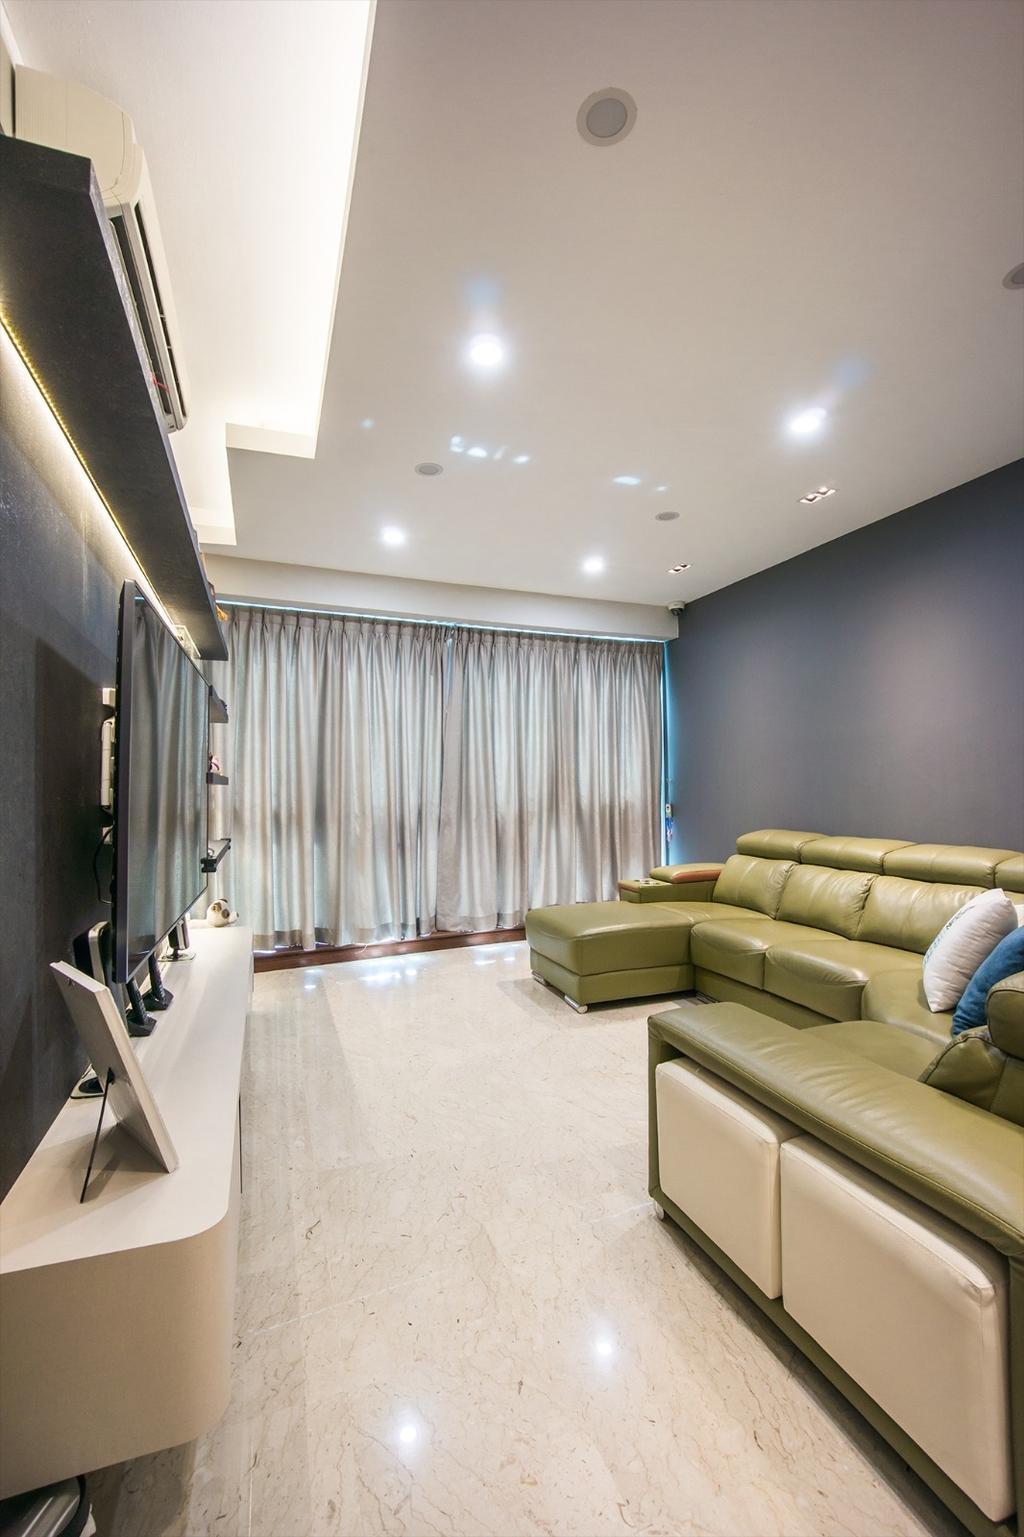 Transitional, Condo, Palm Gardens, Interior Designer, Flo Design, Couch, Furniture, Sink, Indoors, Interior Design